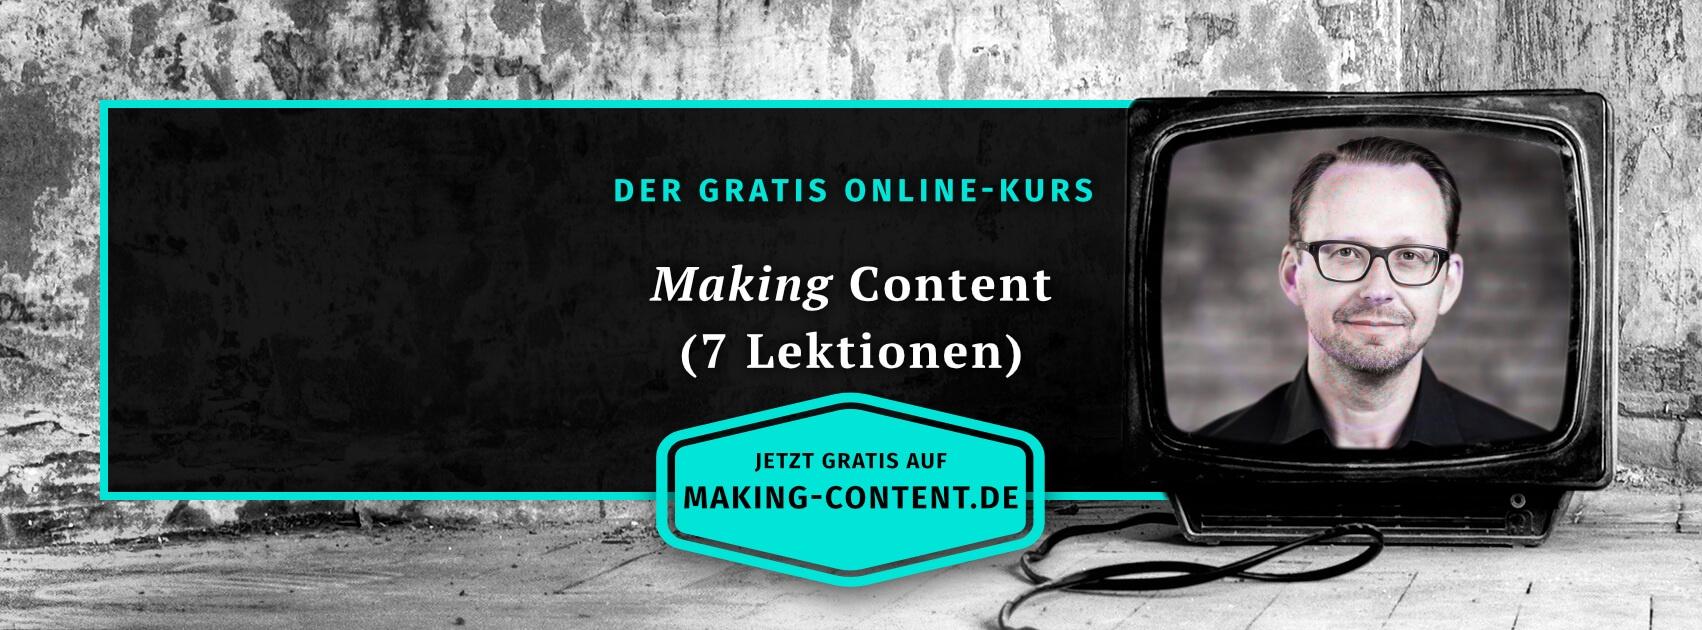 Online-Kurs Making Content von Crispy Content